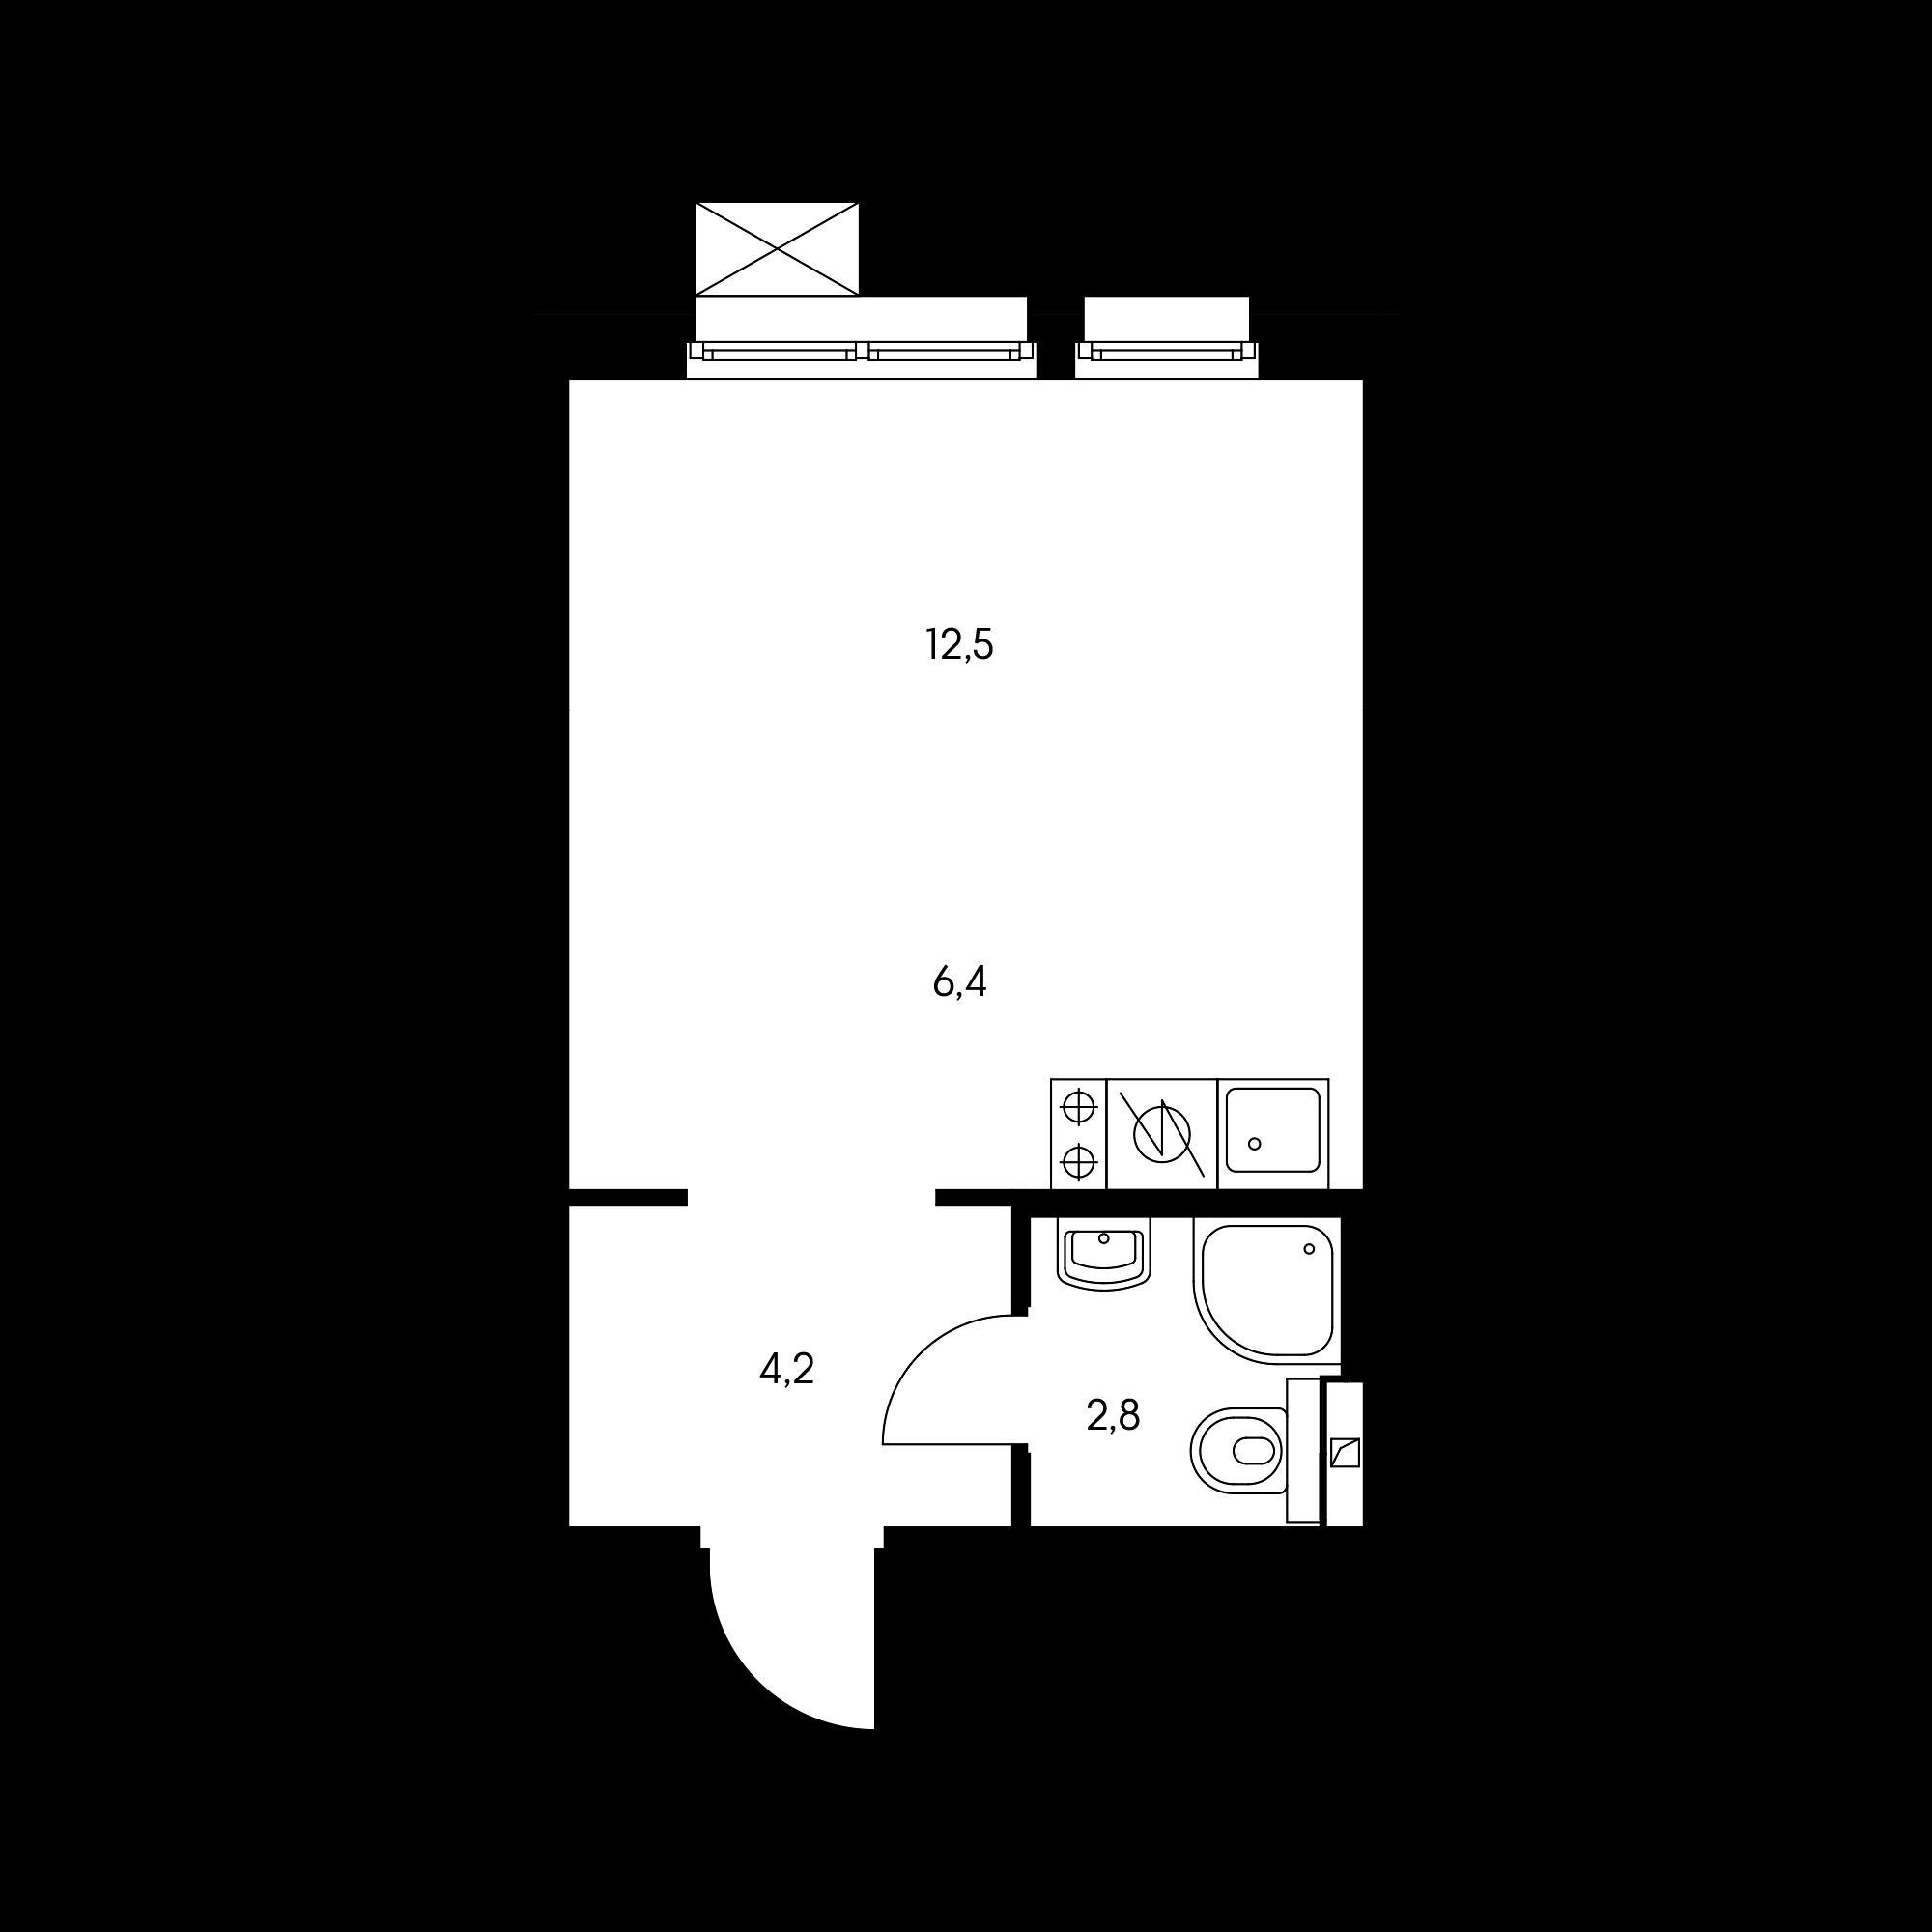 1NM1_4.5-1